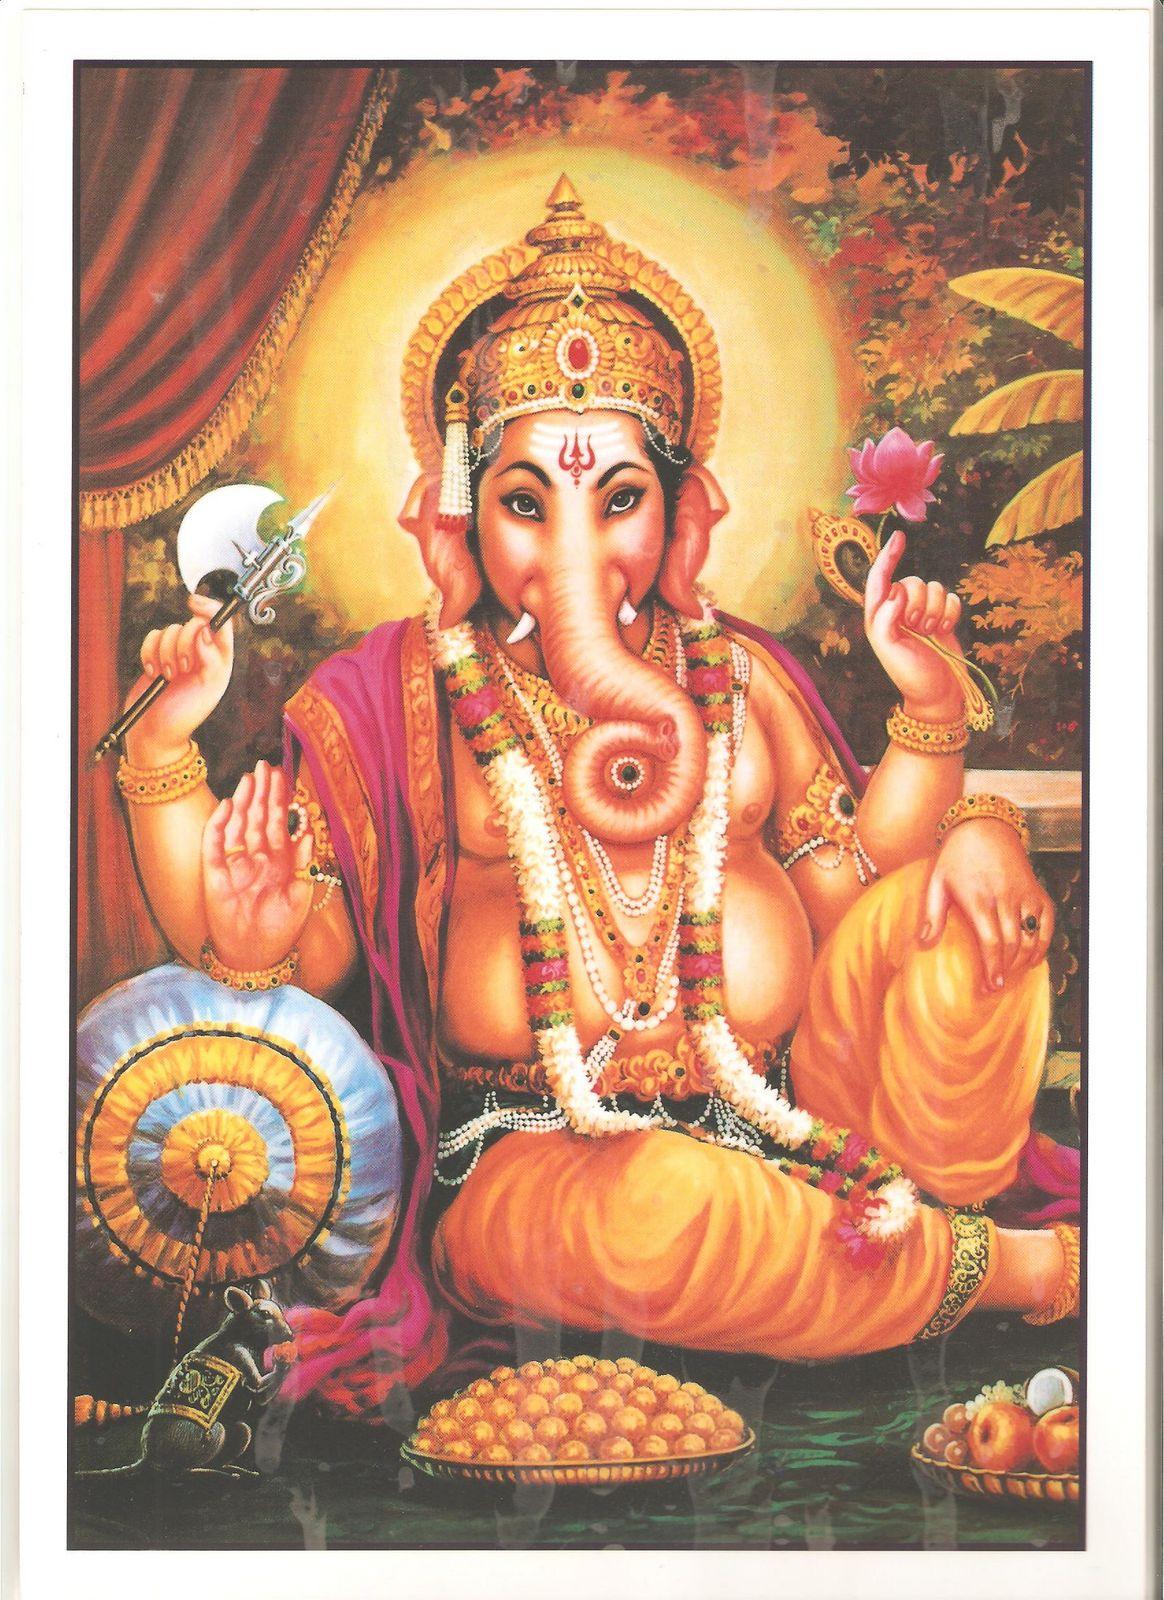 Lord Ganesha Pooja Procedure Revealed By Guruji Shri Narendra Babu Sharmaji